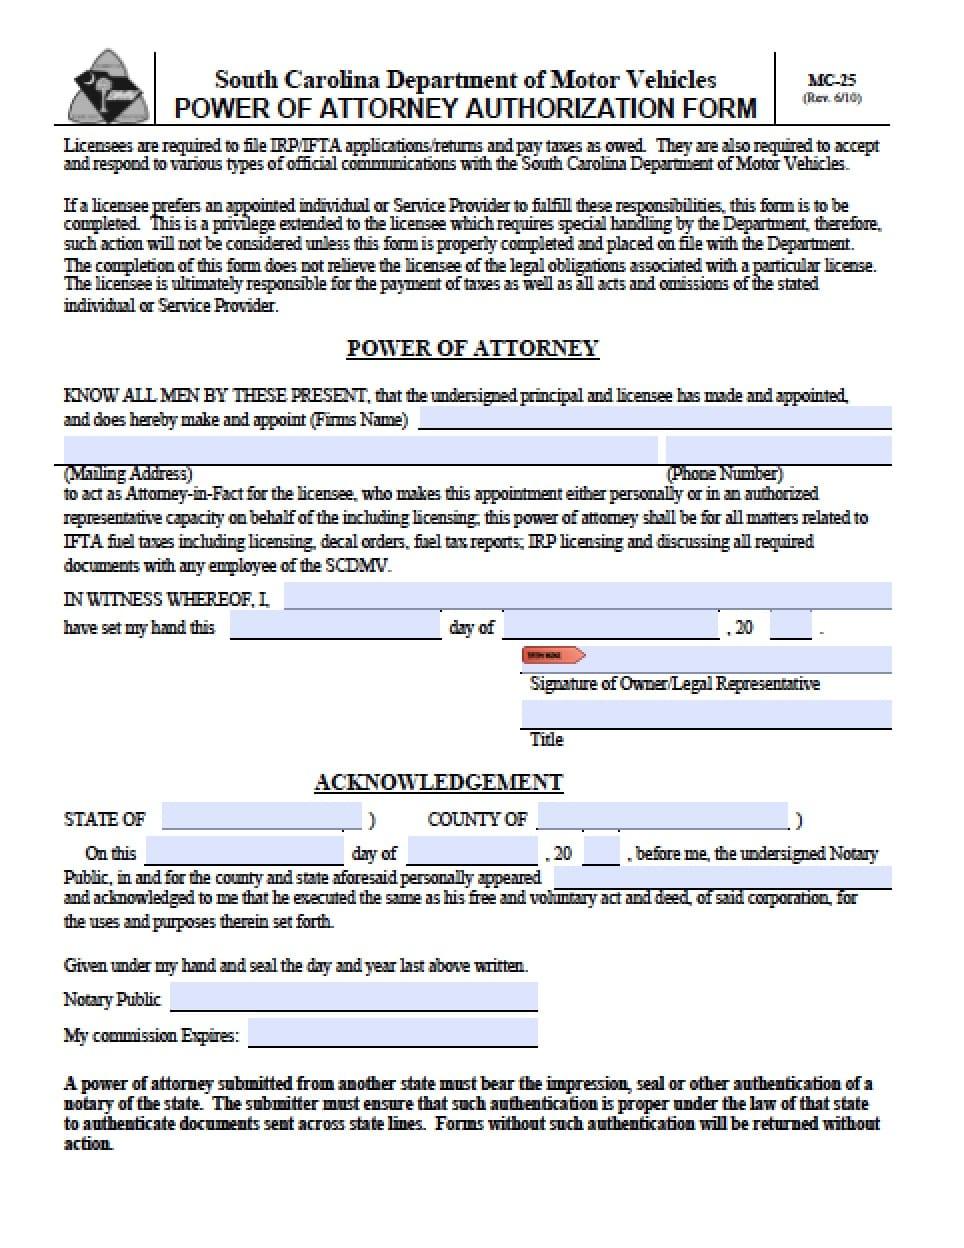 South Carolina Minor Child Power of Attorney Form - Power of ...